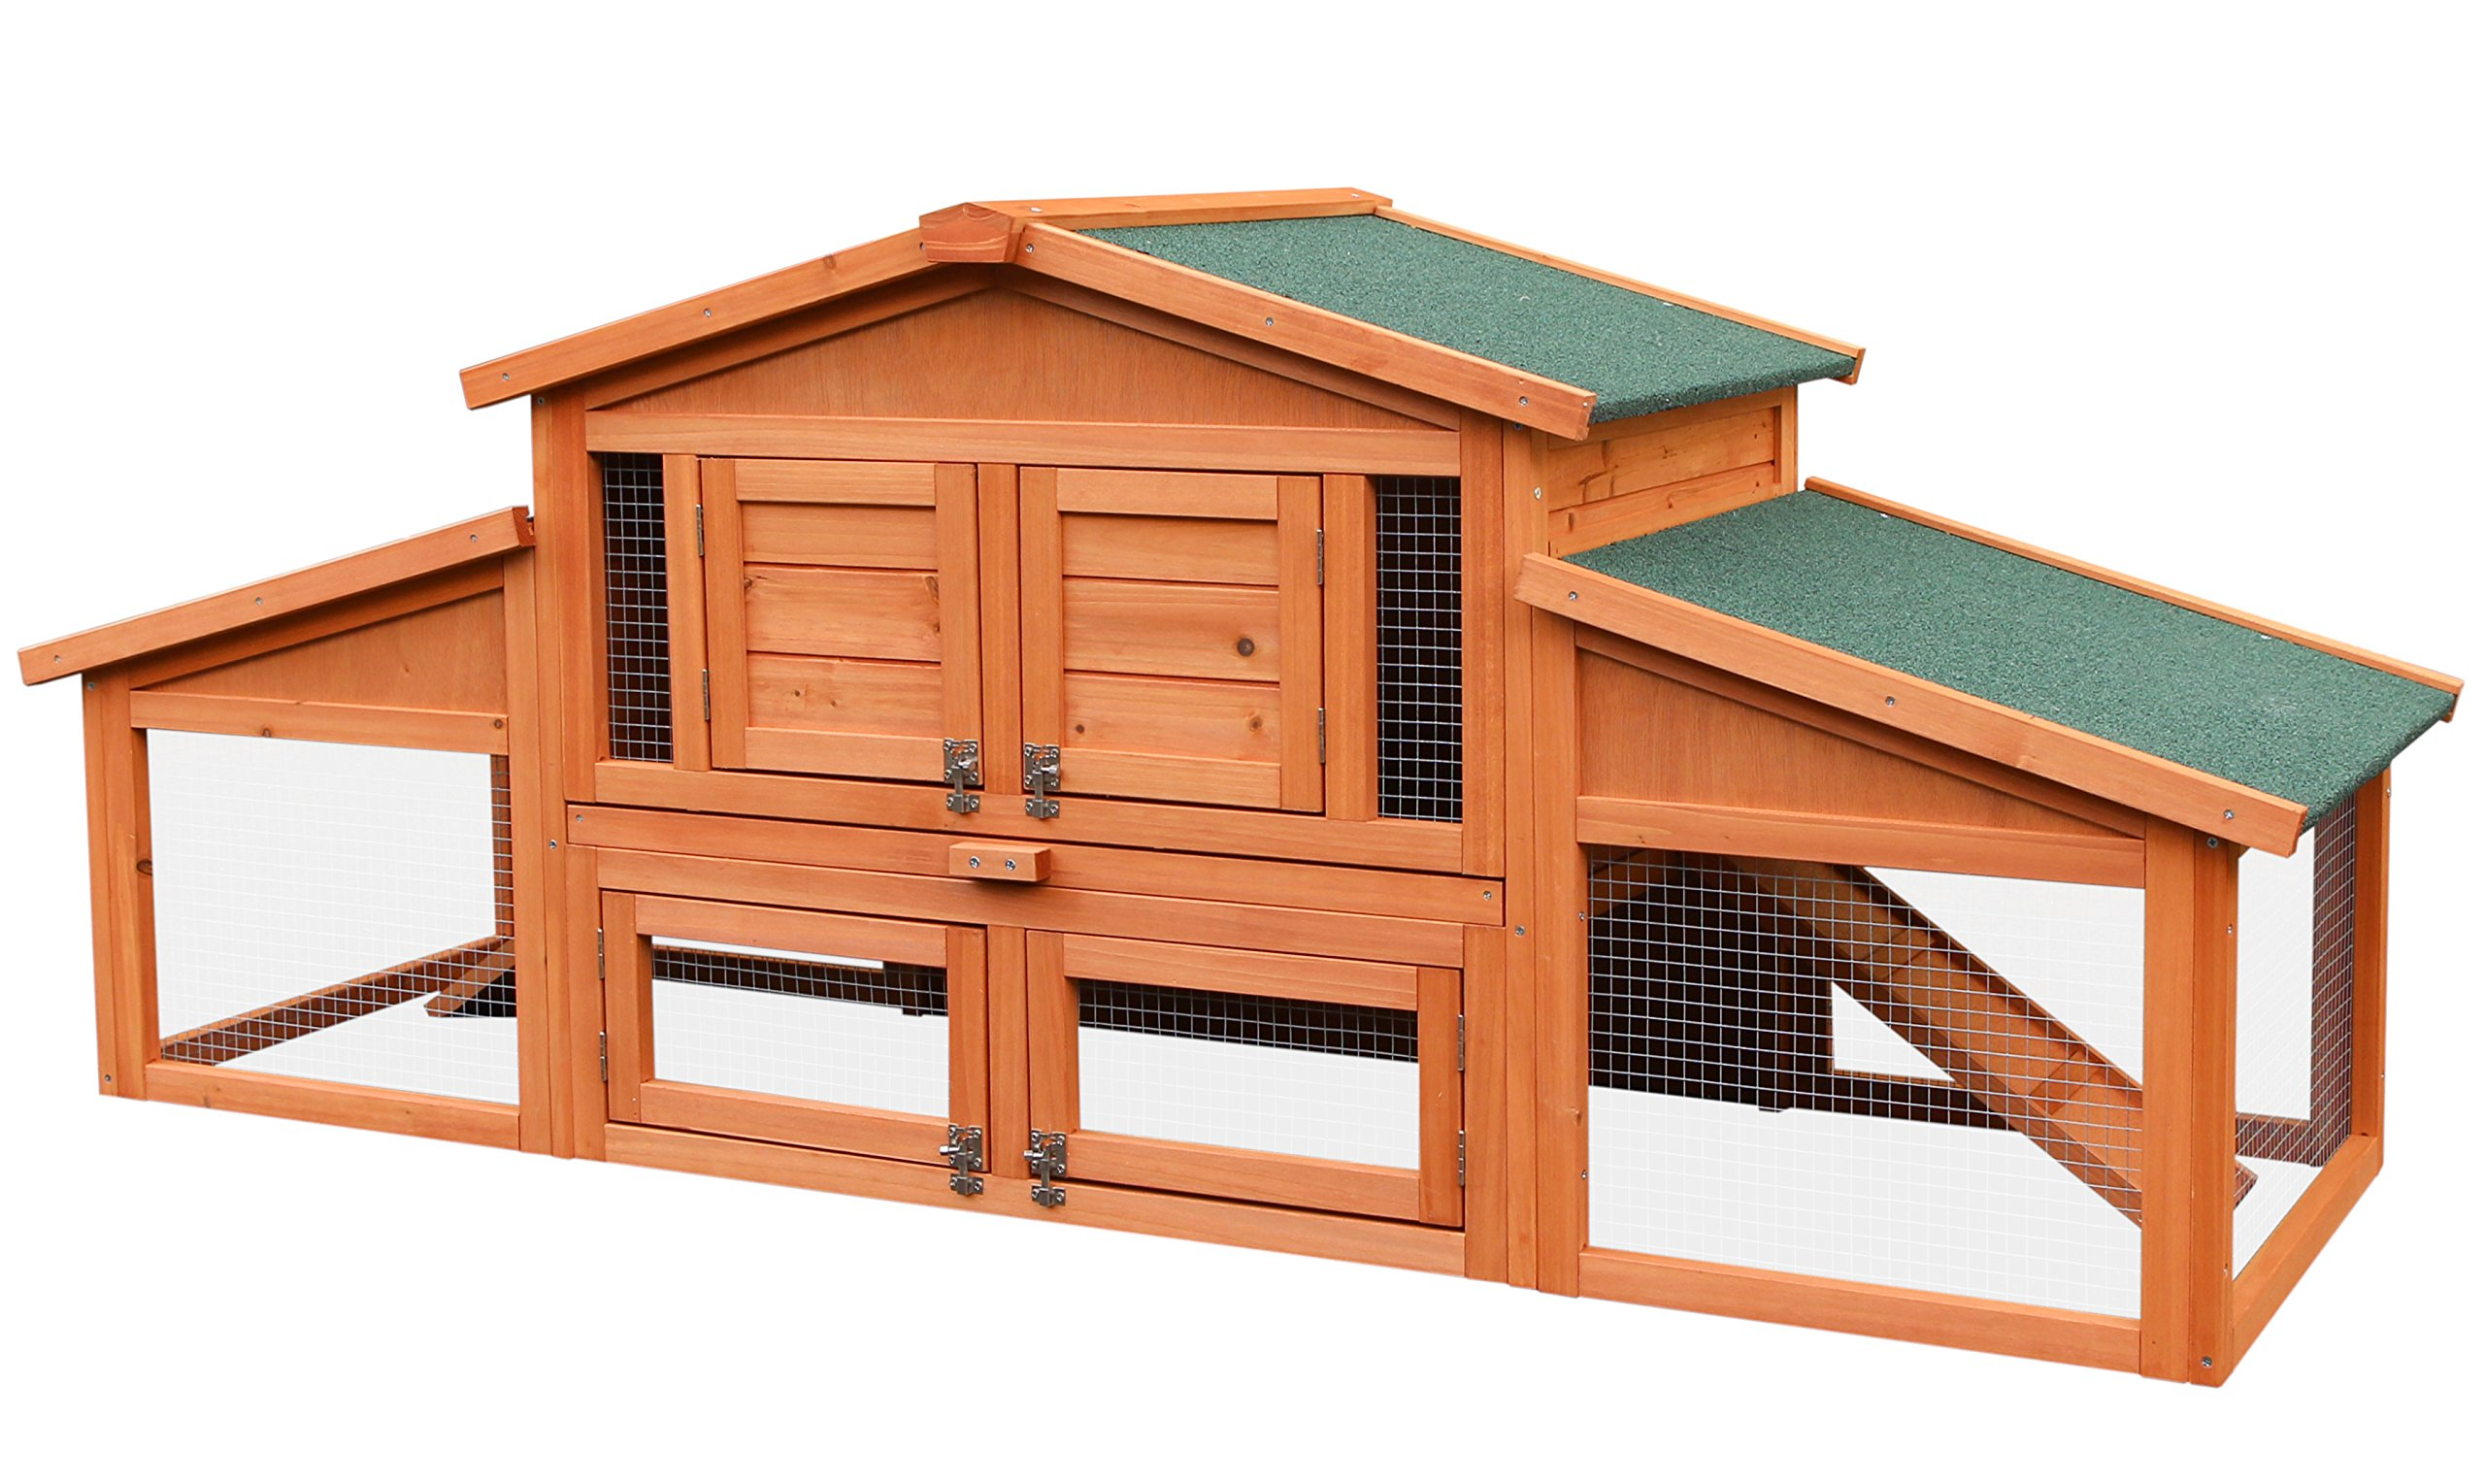 hutch pdp rabbit solid pet oscar ca wood wayfair arianna reviews archie